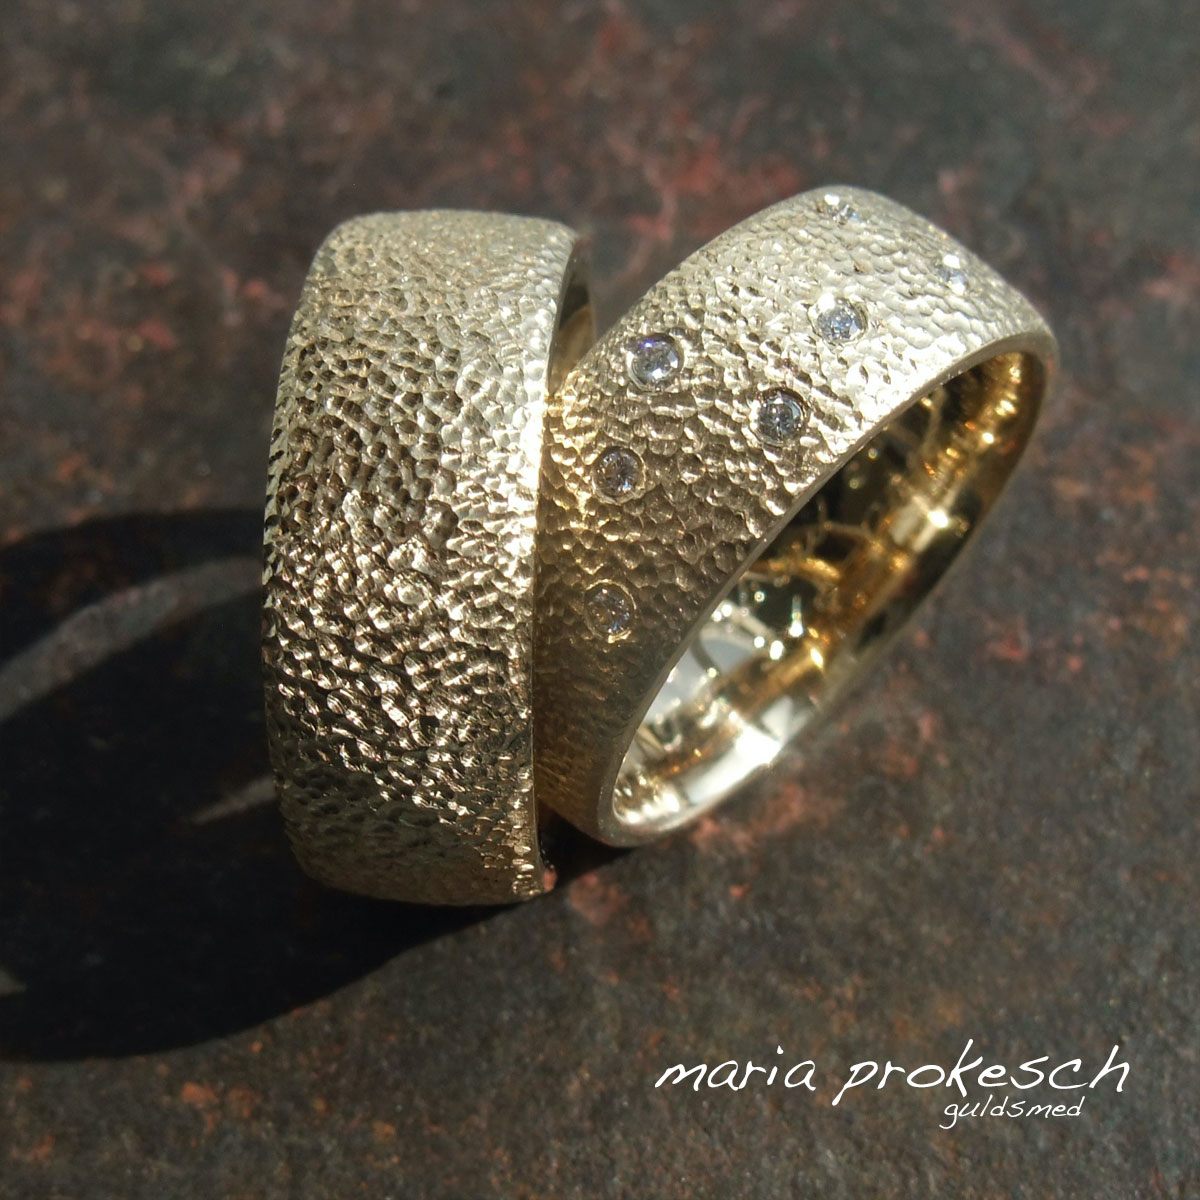 Rustikke vielsesringe i 14 kt guld med små grove fordybninger der ligner kugle hammerslået. I hendes ring små brillanter som stjernedrys